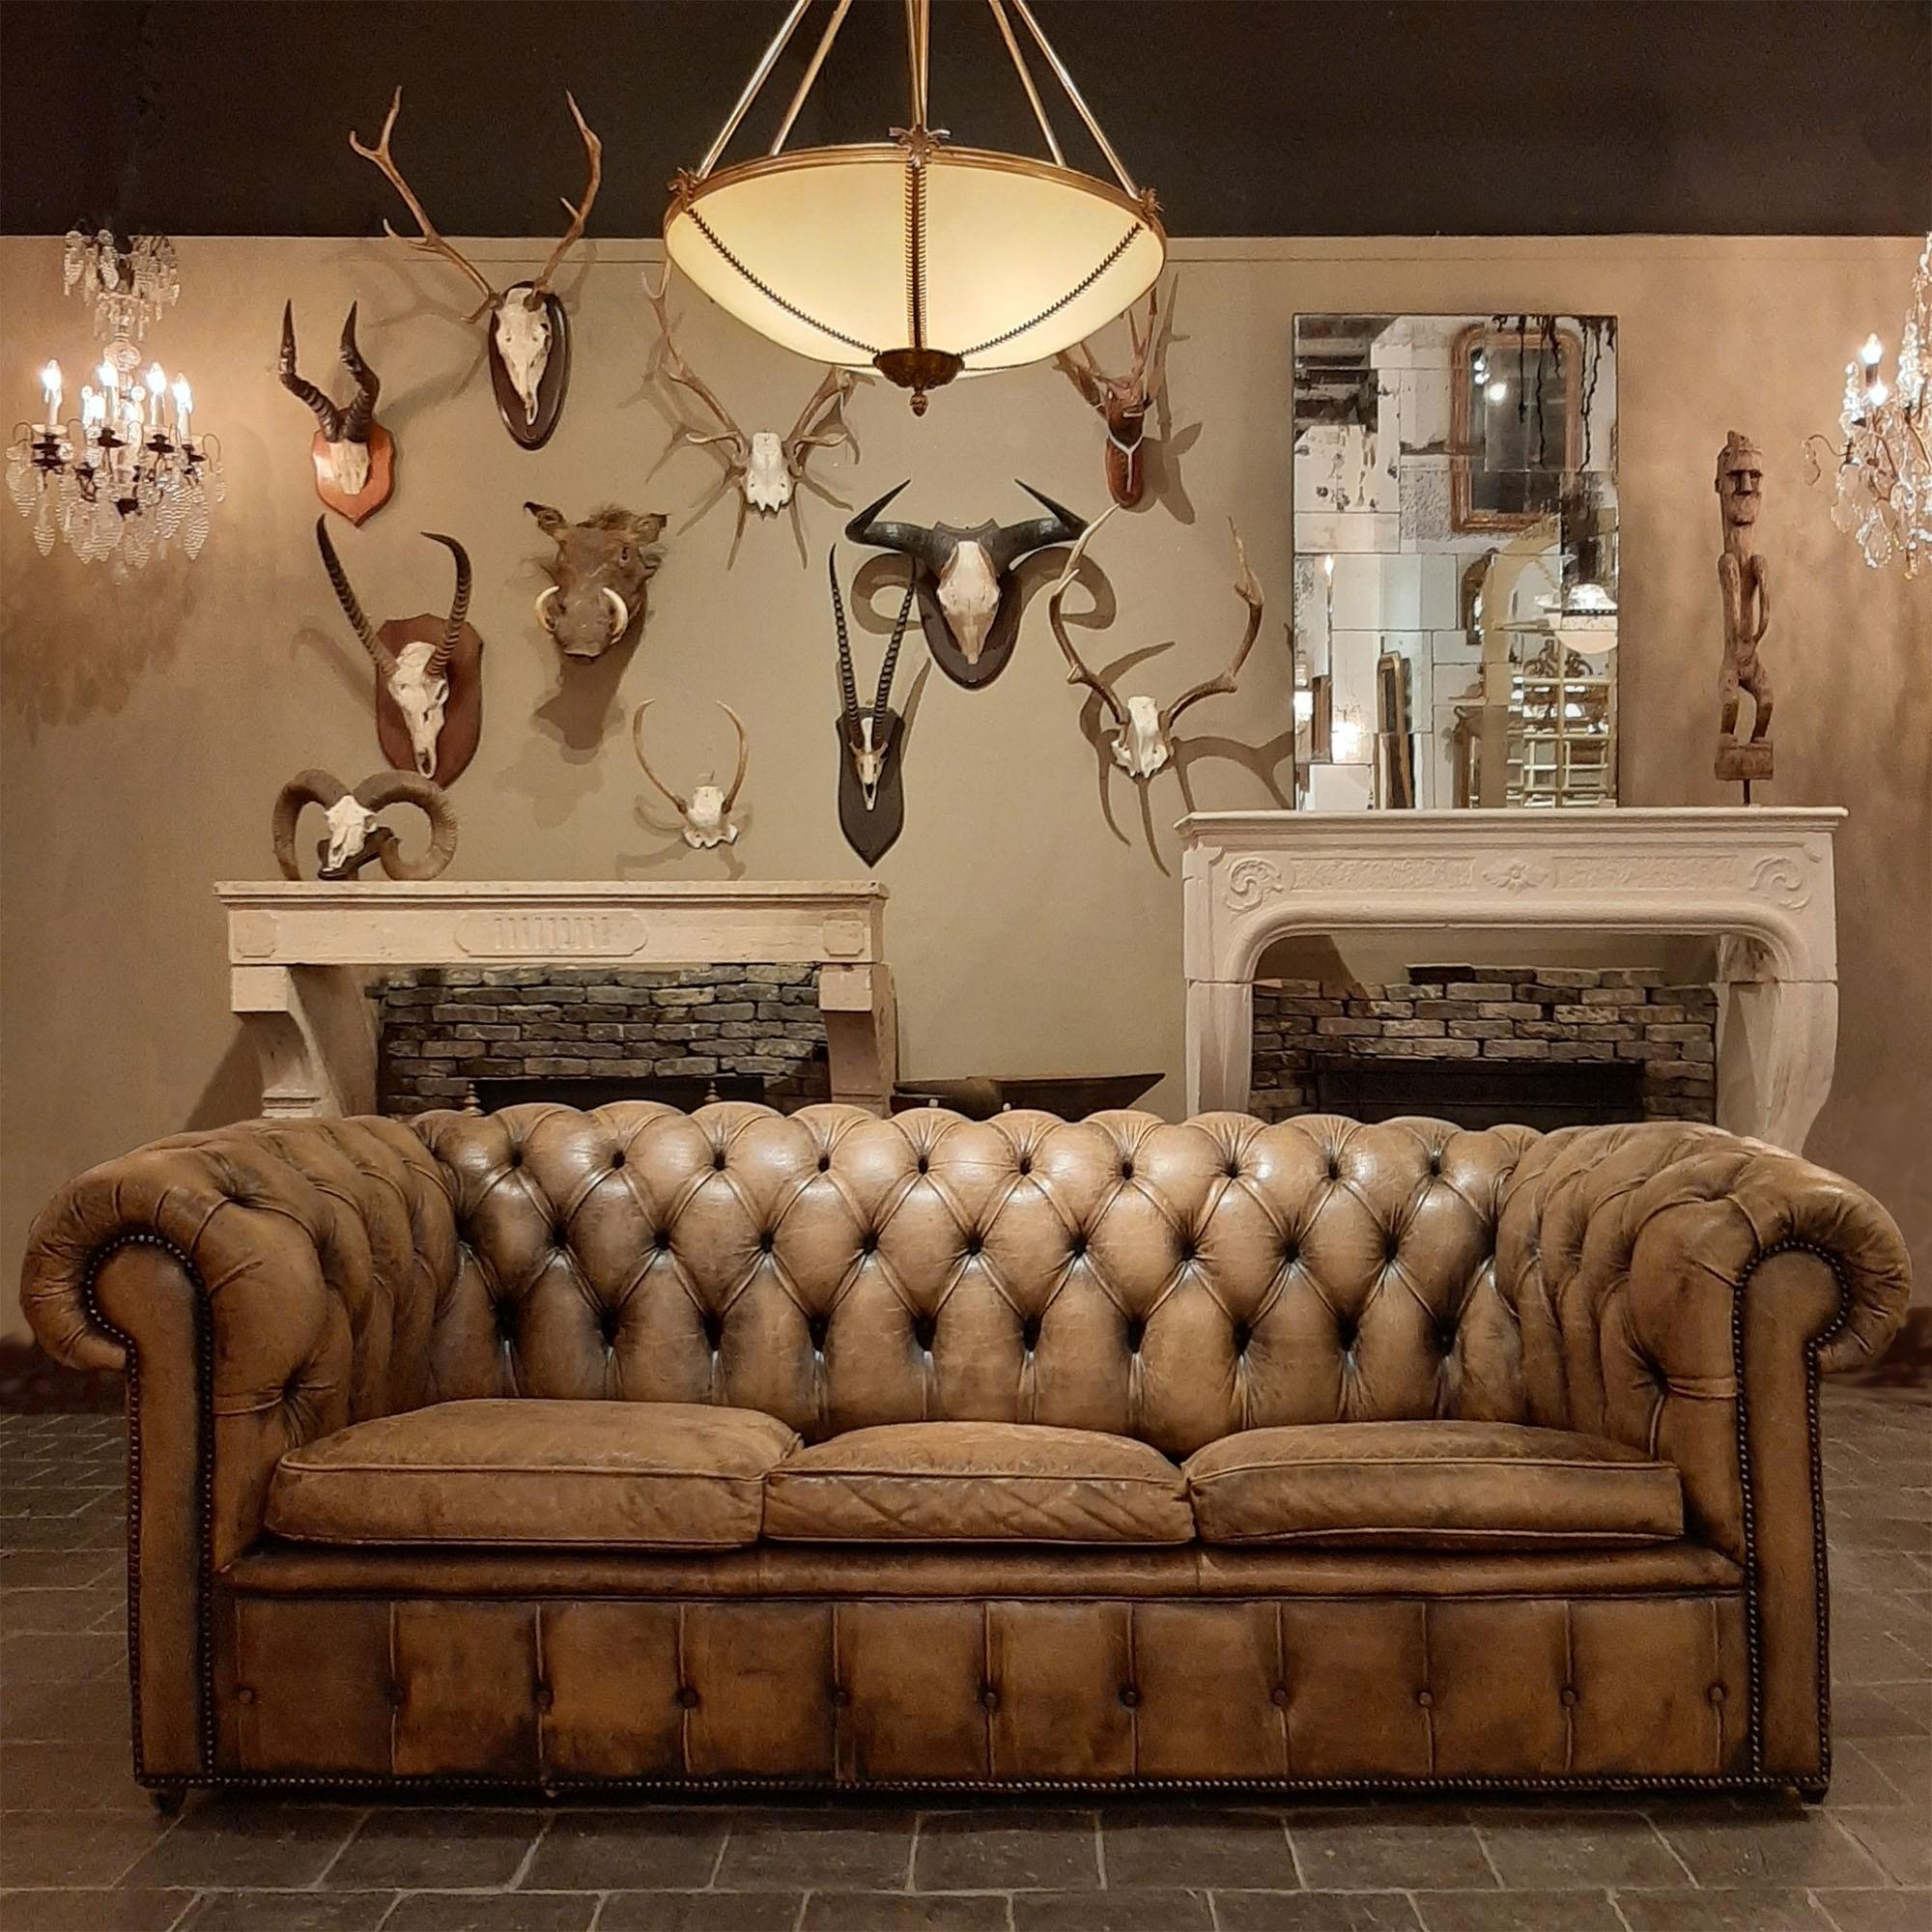 Genuine vintage chesterfield leather sofa